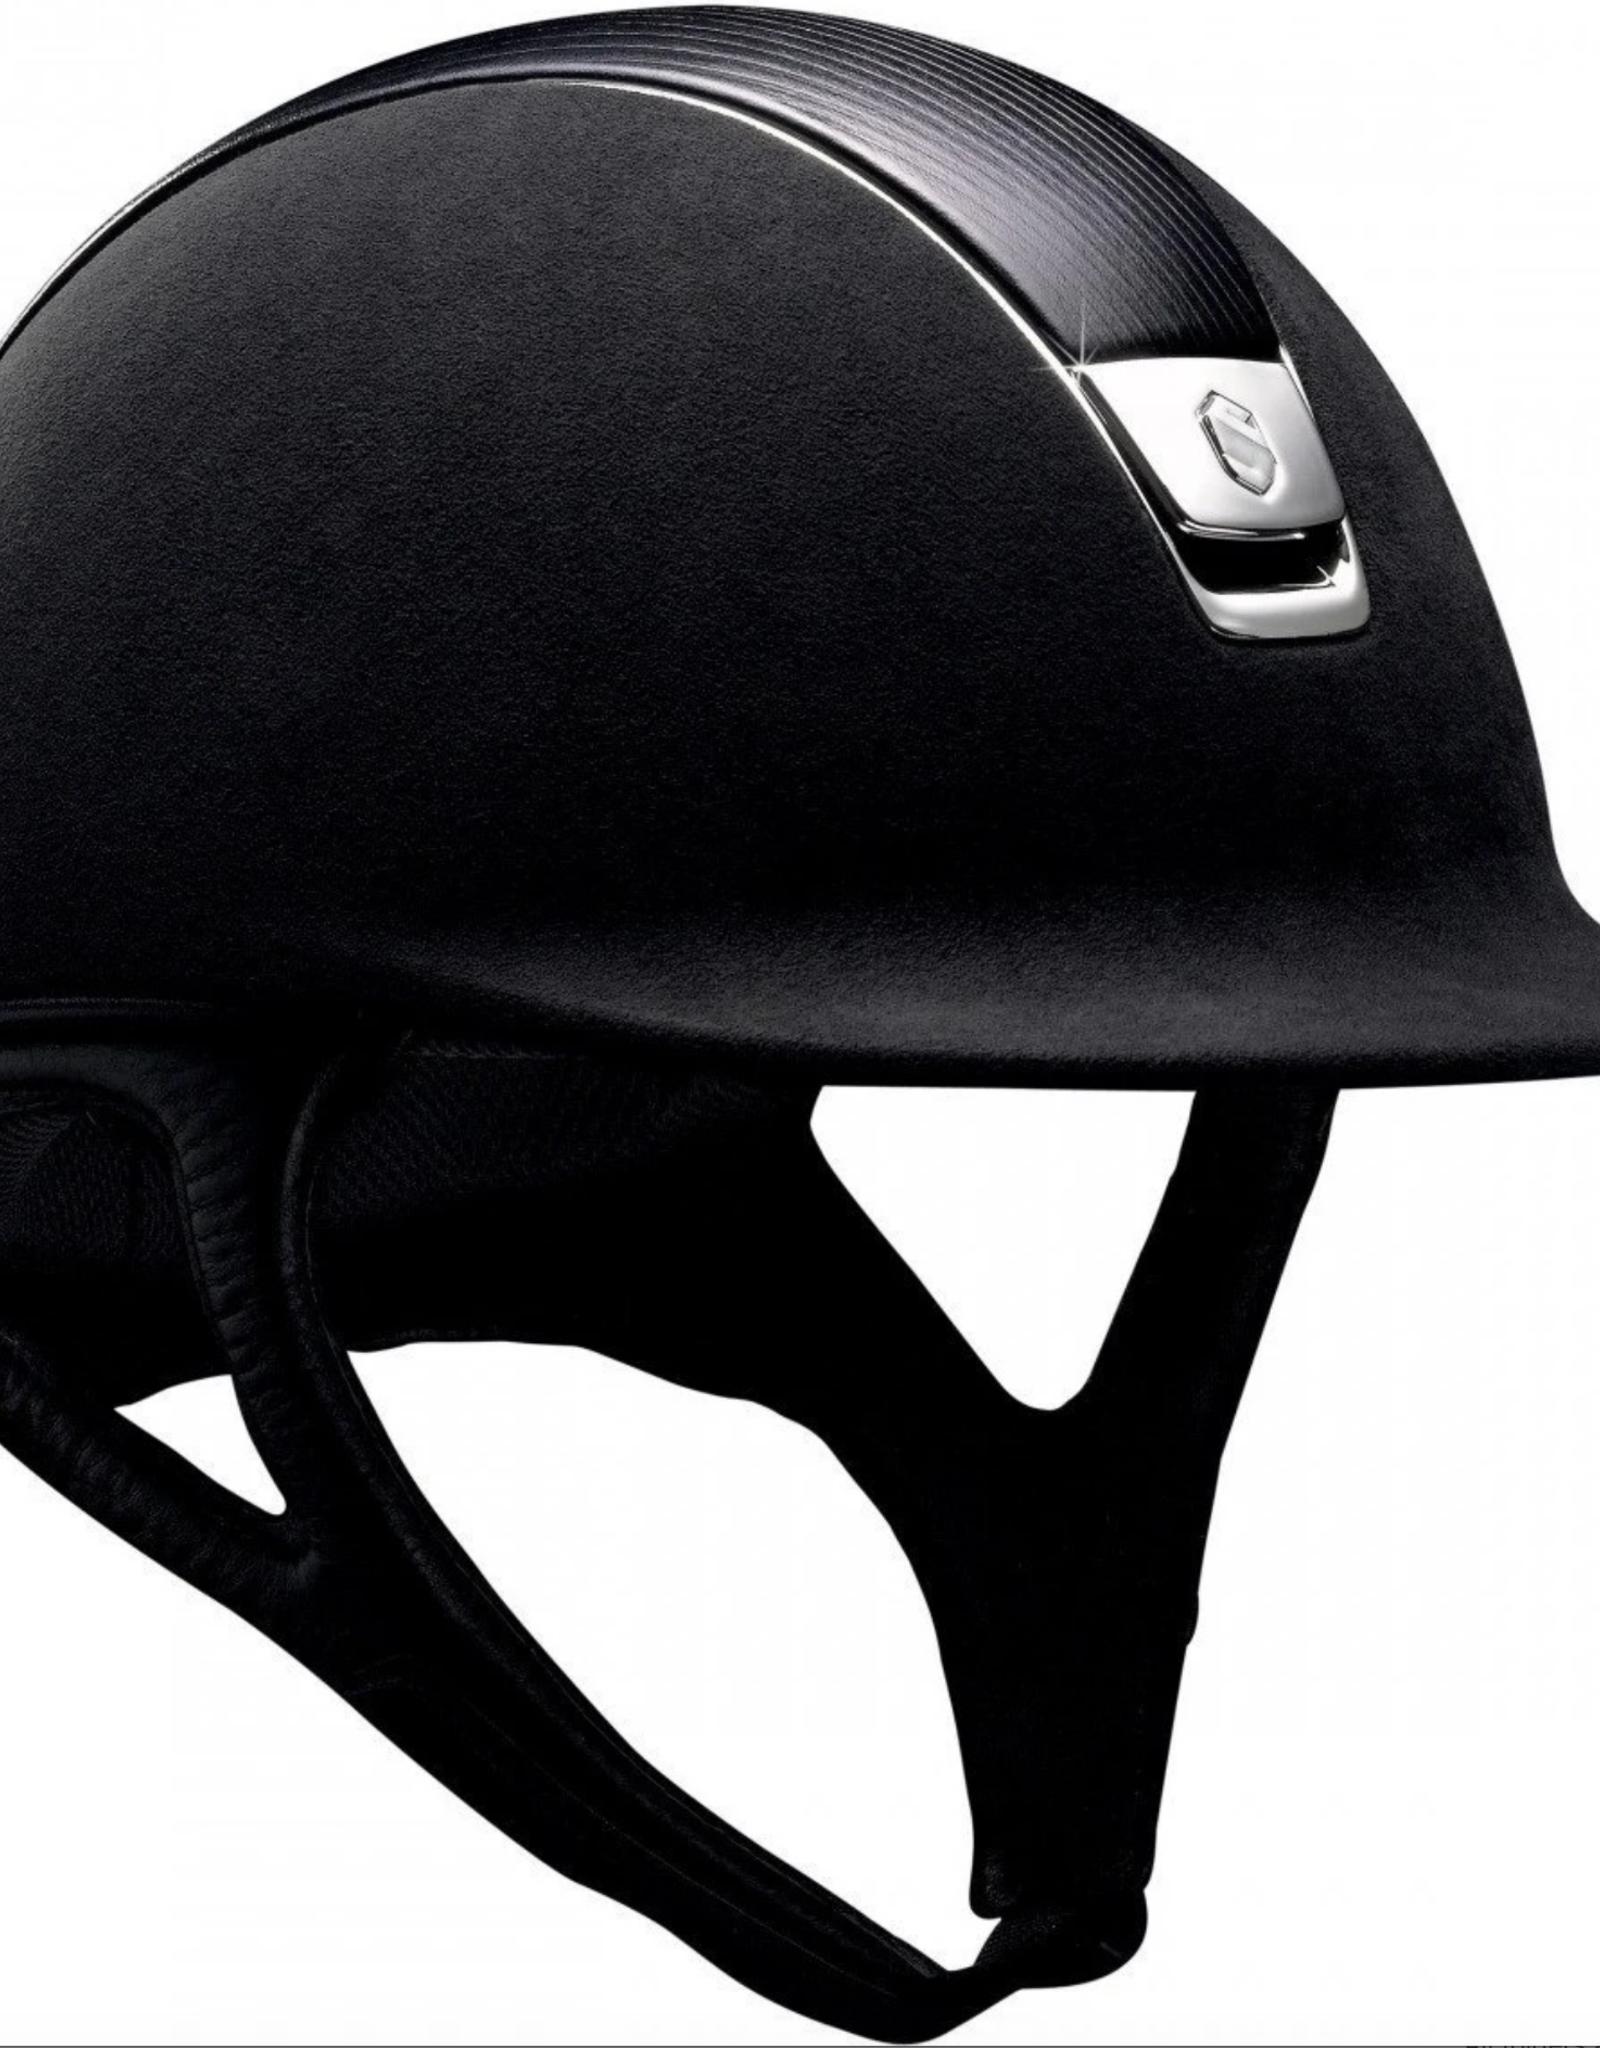 Samshield Premium with Leather Top Helmet